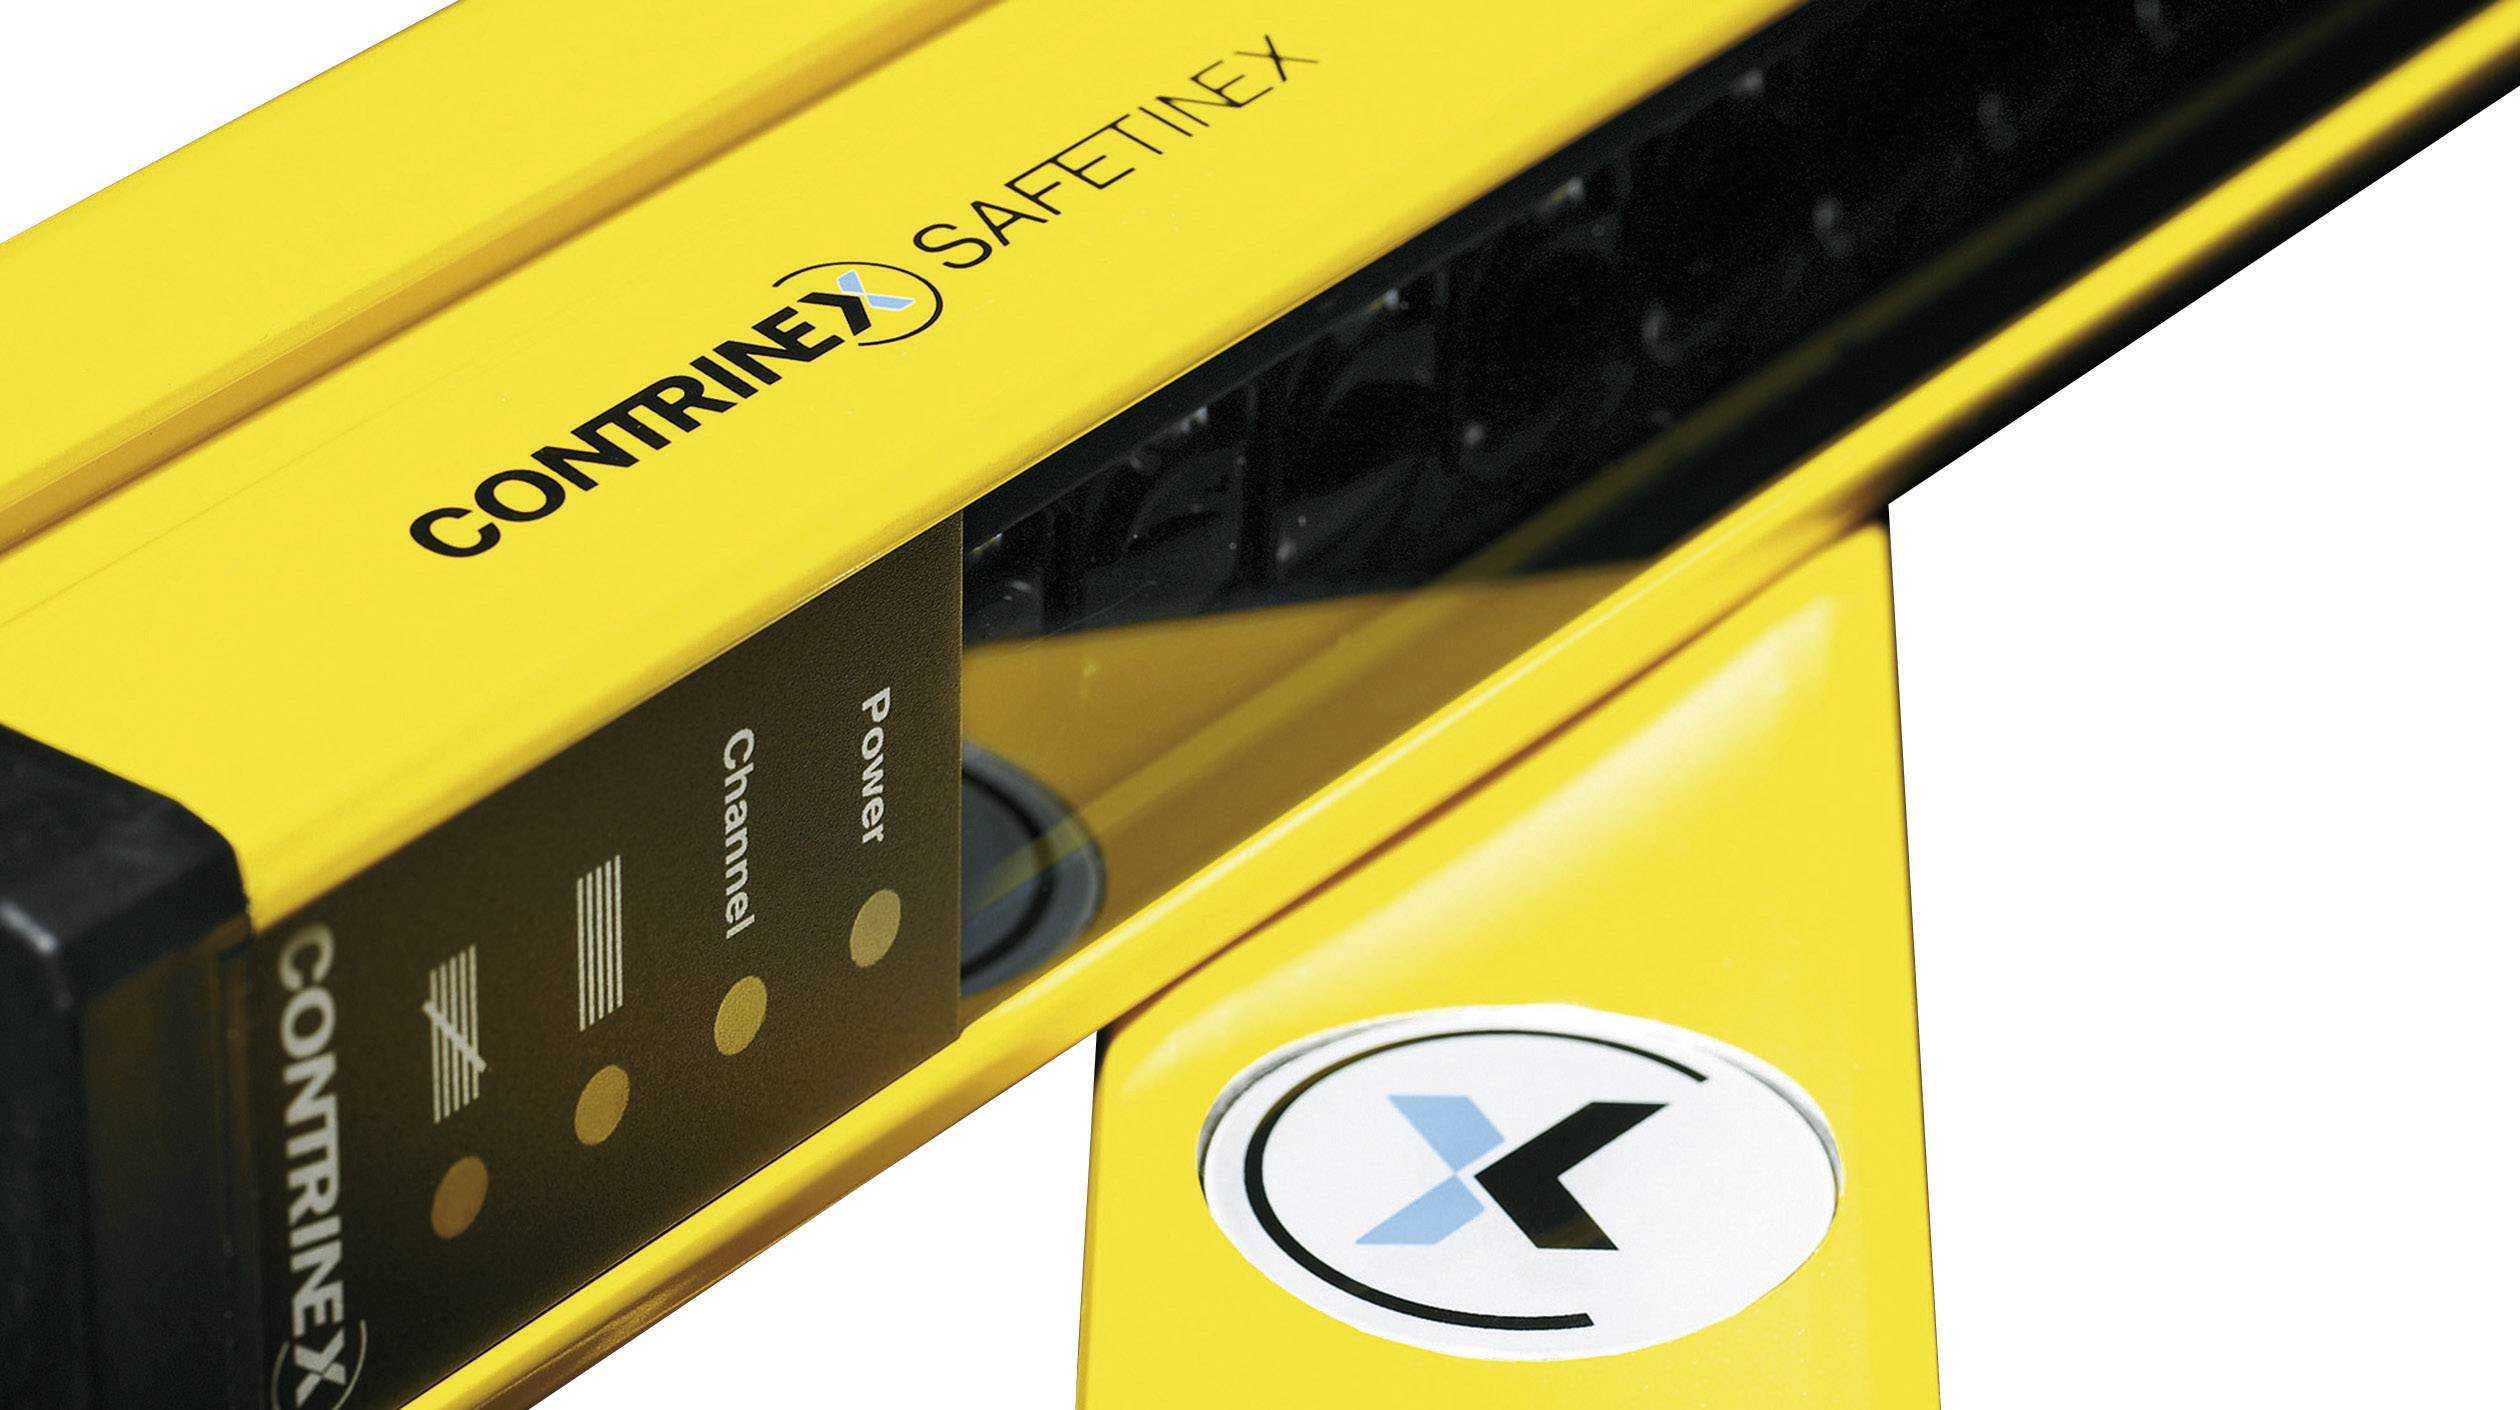 Contrinex YBB-30R4-1700-G012 630 000 735